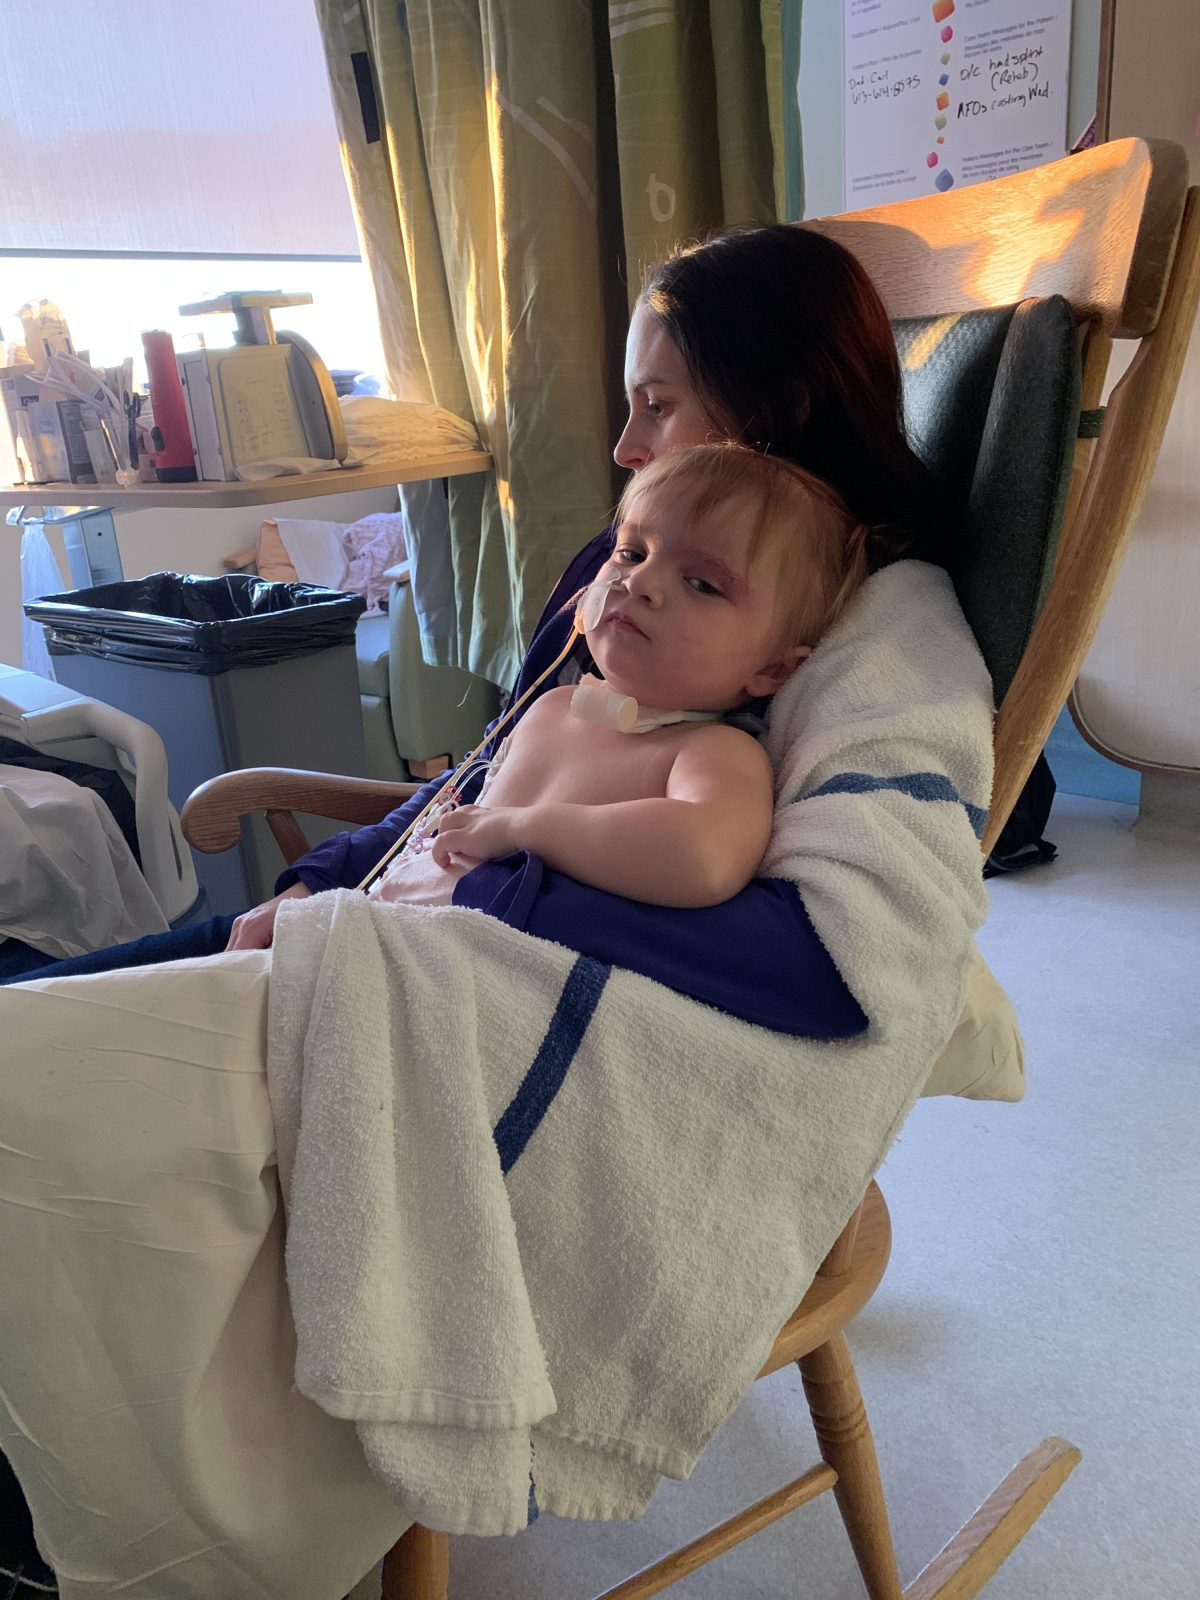 Children's Hospital of Eastern Ontario (CHEO) Room with Adélie